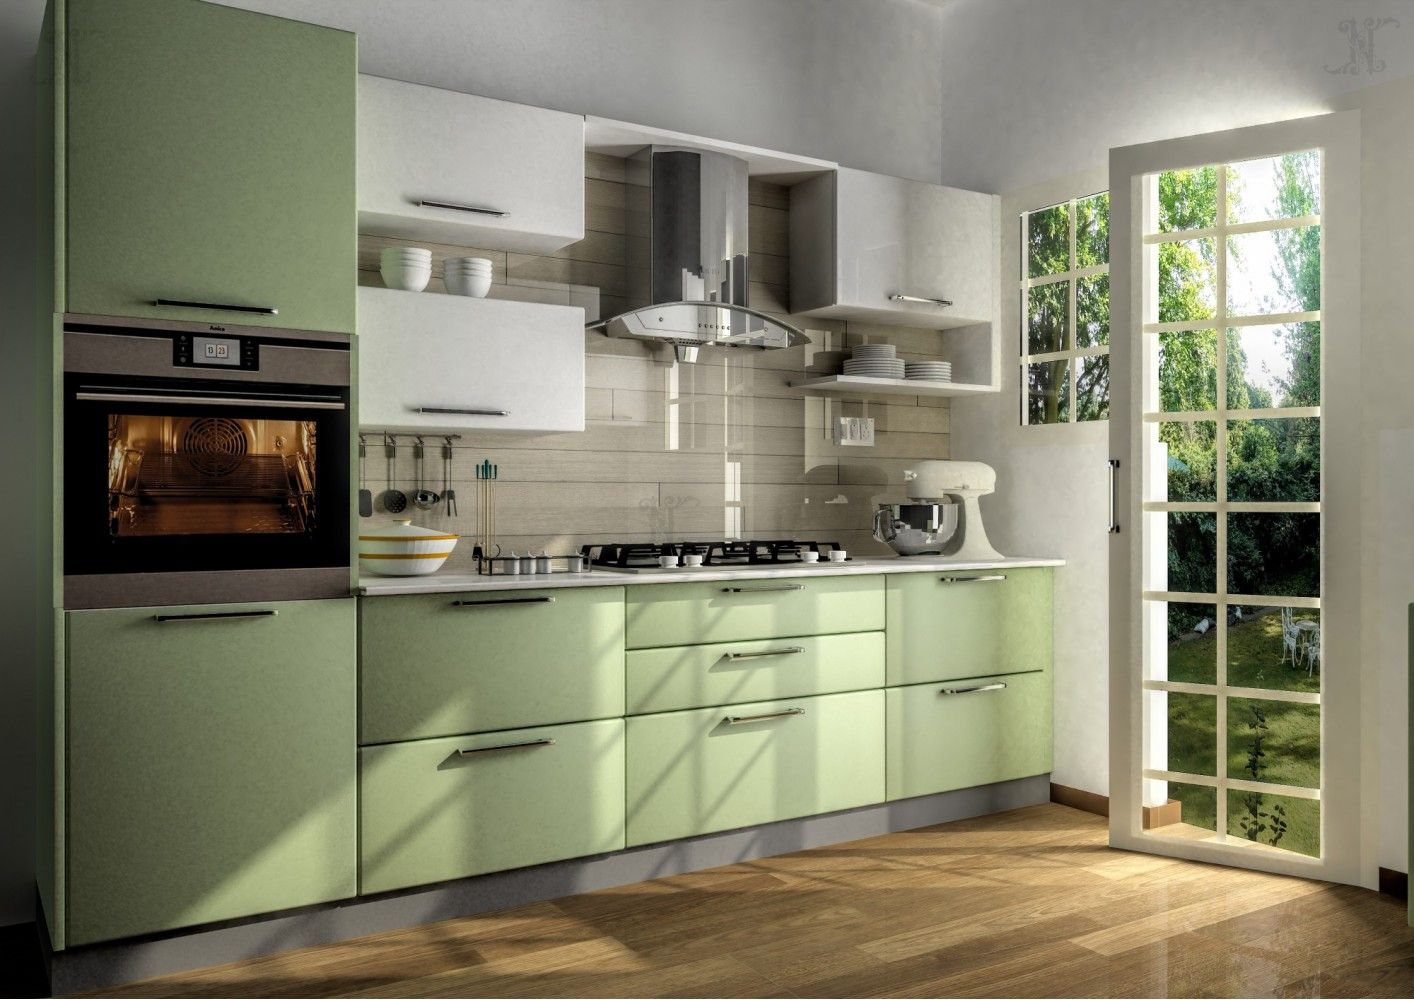 indian parallel kitchen interior design Google Search